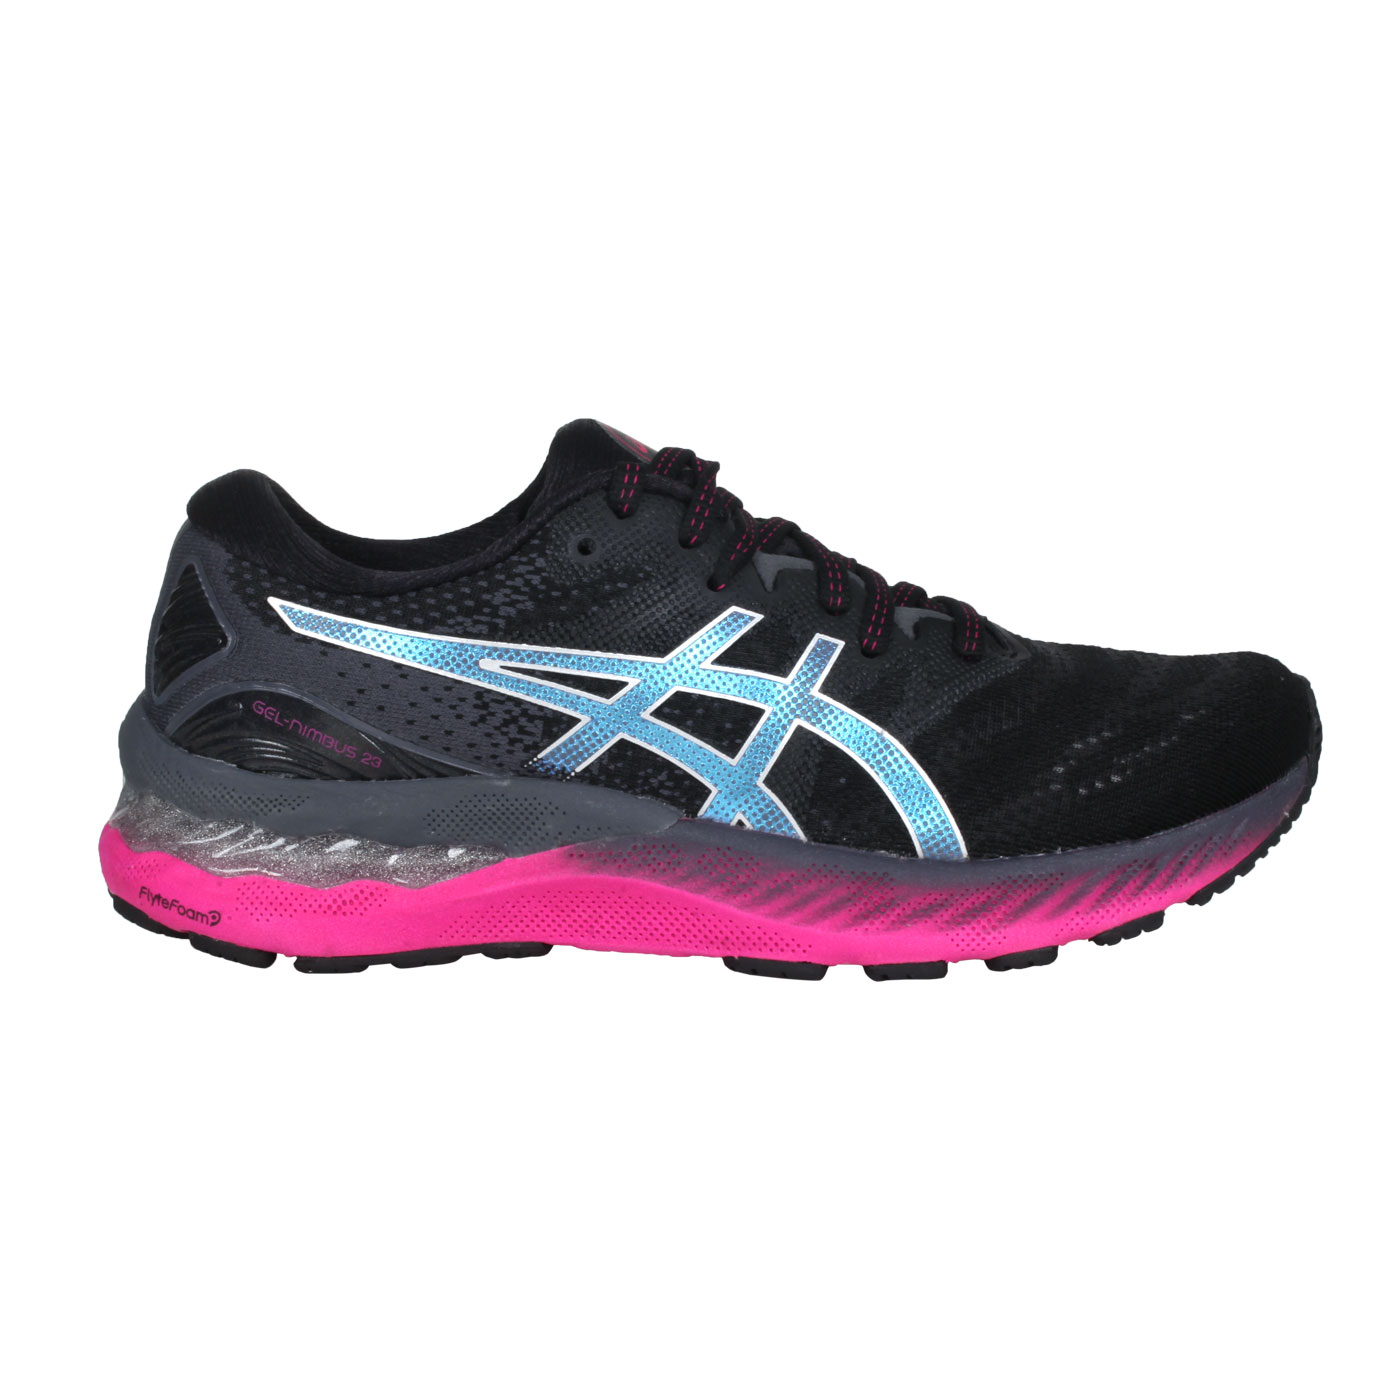 ASICS 女款慢跑鞋  @GEL-NIMBUS 23@1012A885-004